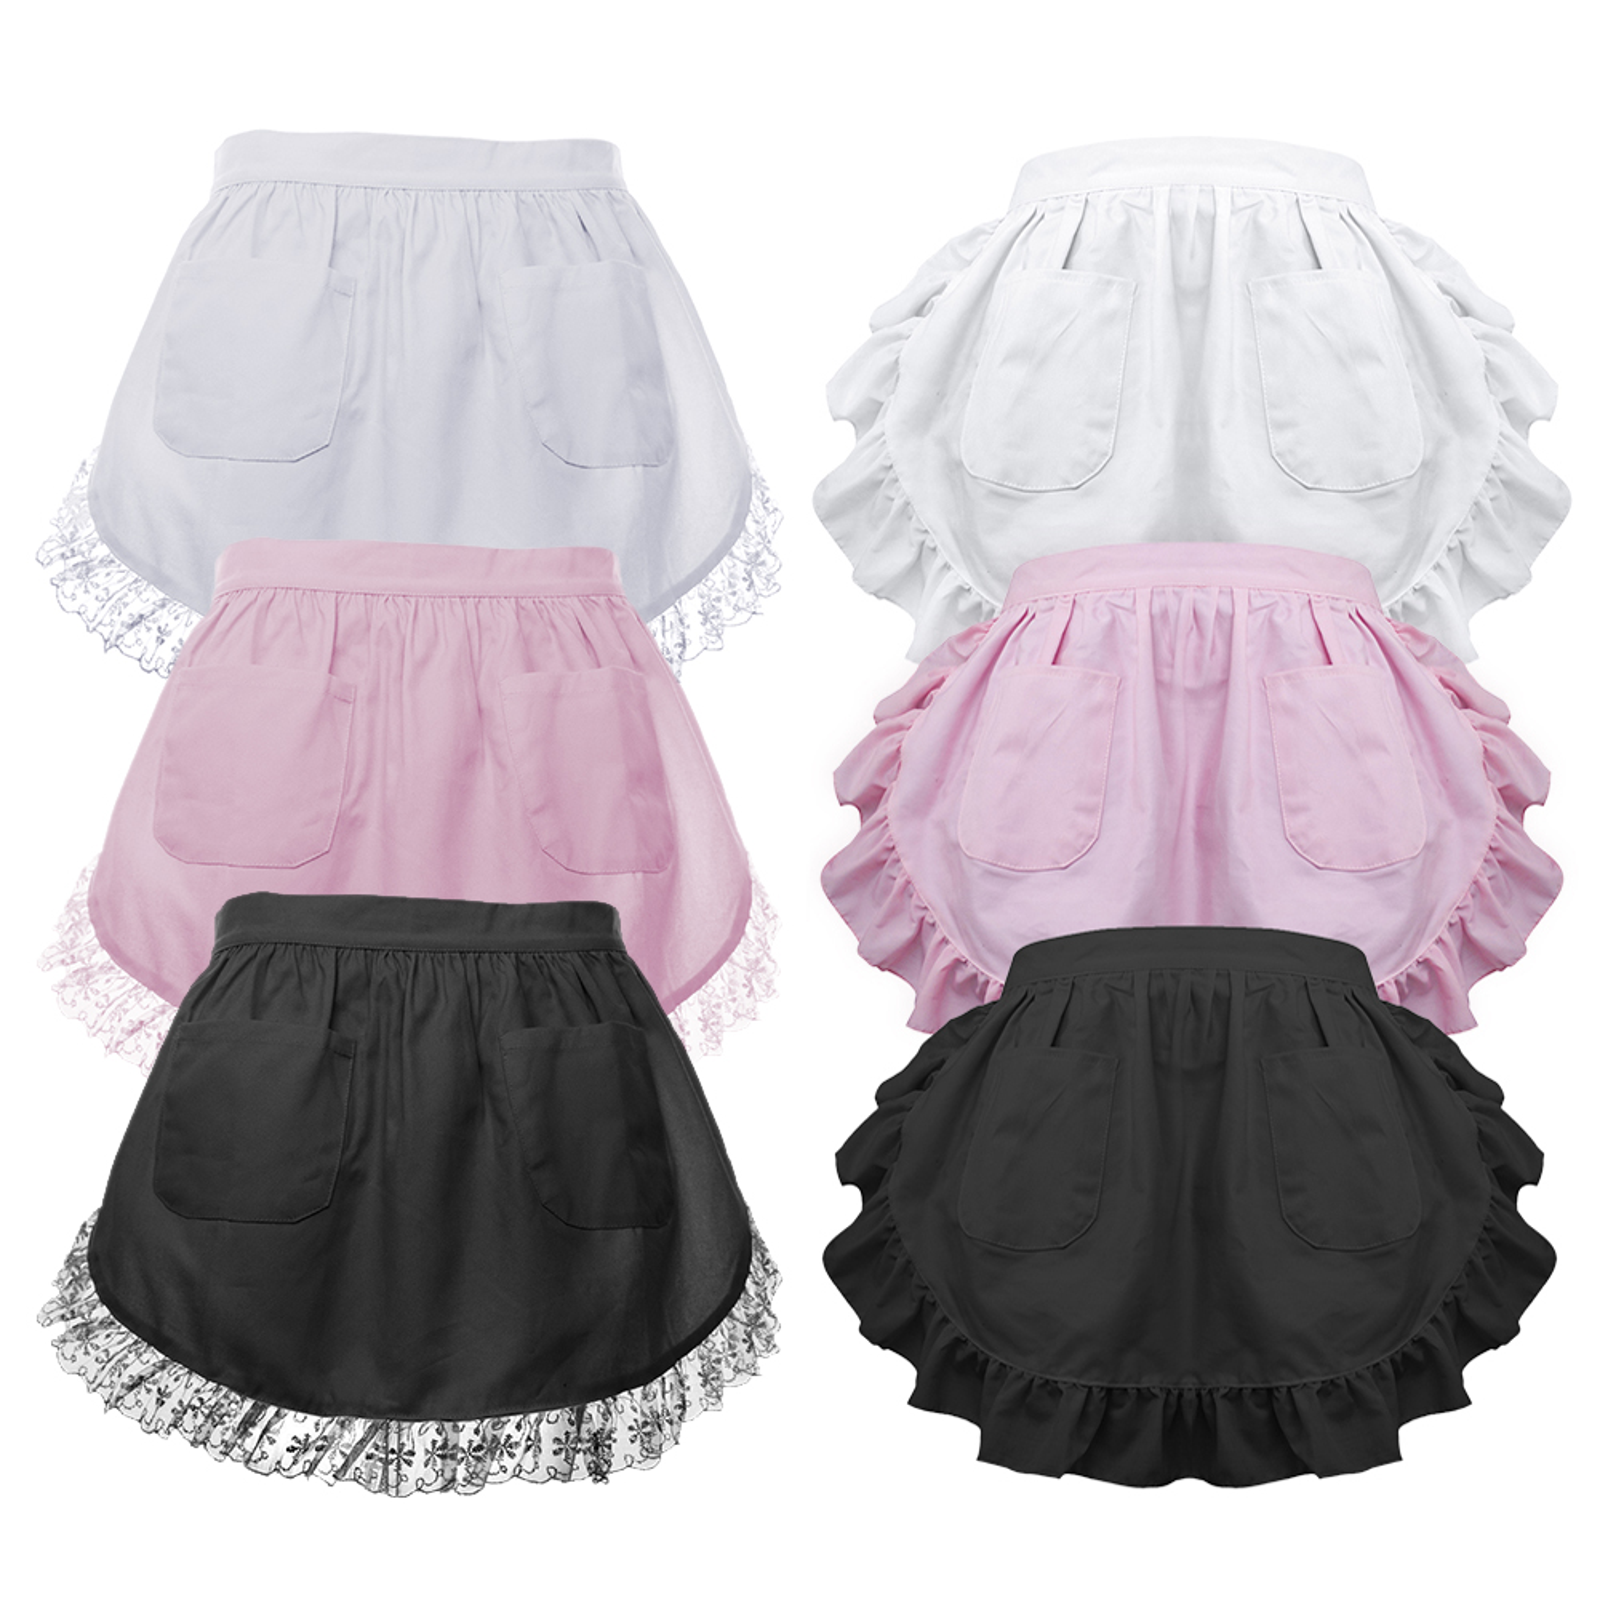 White apron kitchen - Aspire Women S Waist Apron Victorian Maid Costume Lace White Cotton Half Apron Kitchen Party Favors Two Pockets